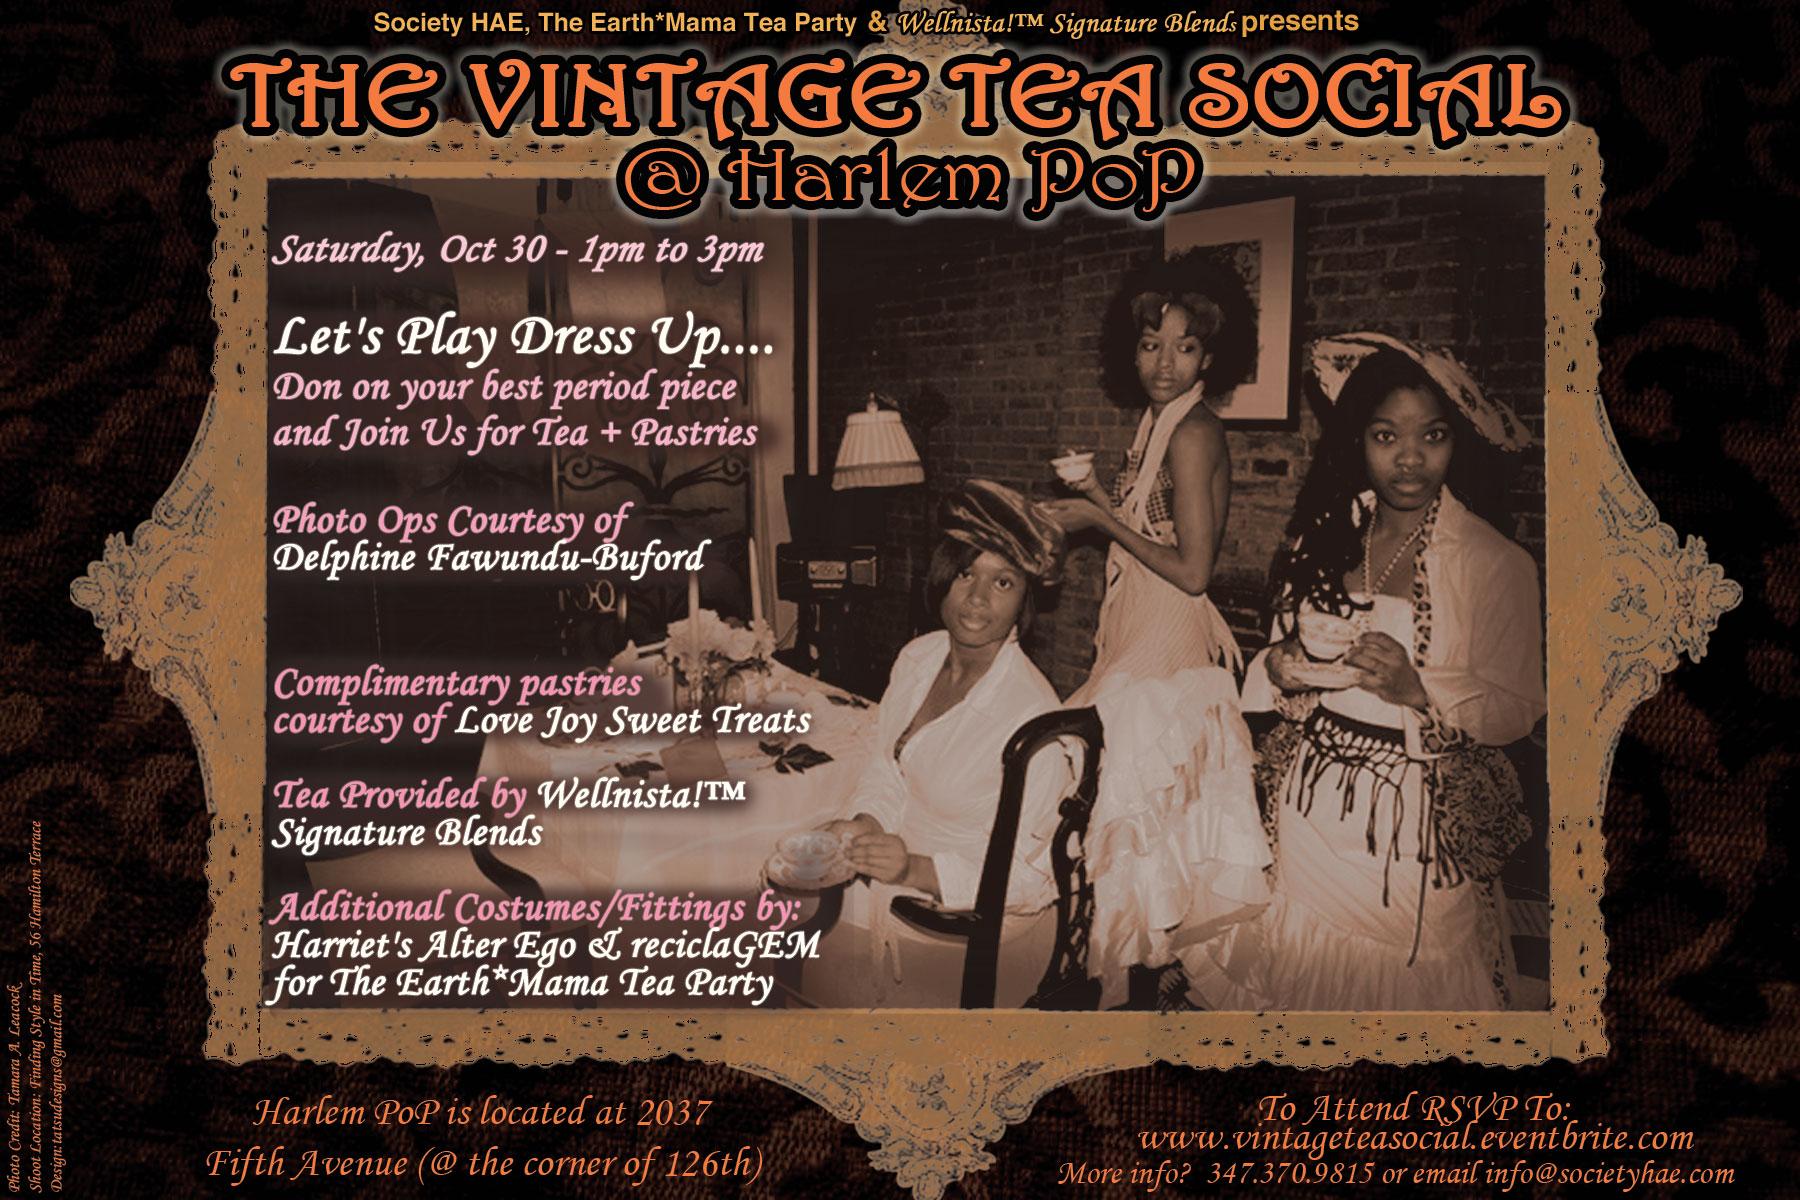 Vintage Tea Social